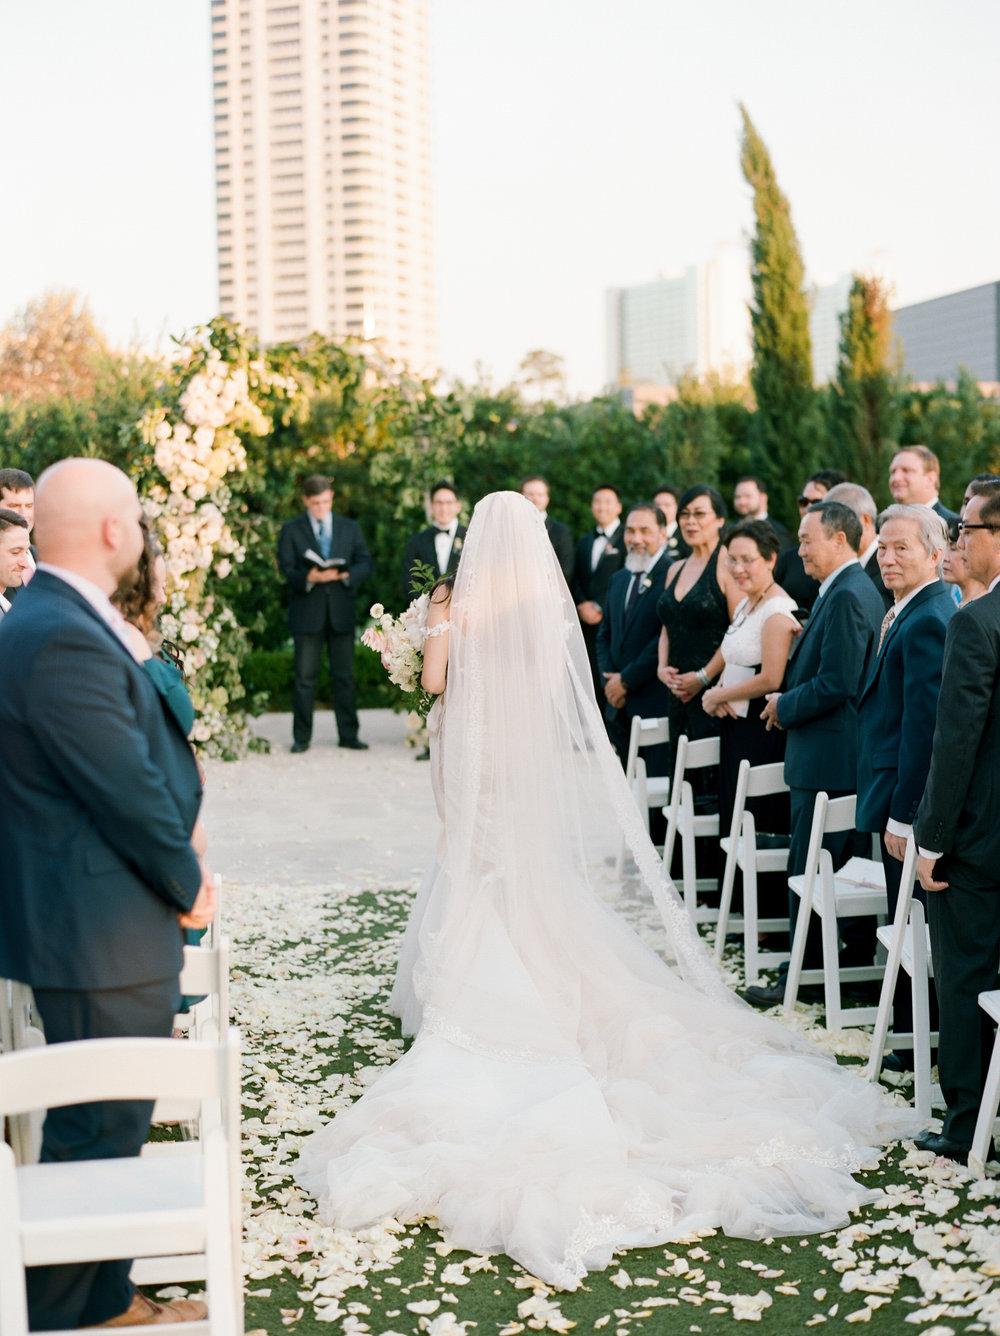 Martha-Stewart-Wedding-Dana-Fernandez-Photography-Josh-Texas-Film-Houston-Wedding-Fine-Art-Photographer-McGovern-Centennial-Gardens-Top-Best-31.jpg